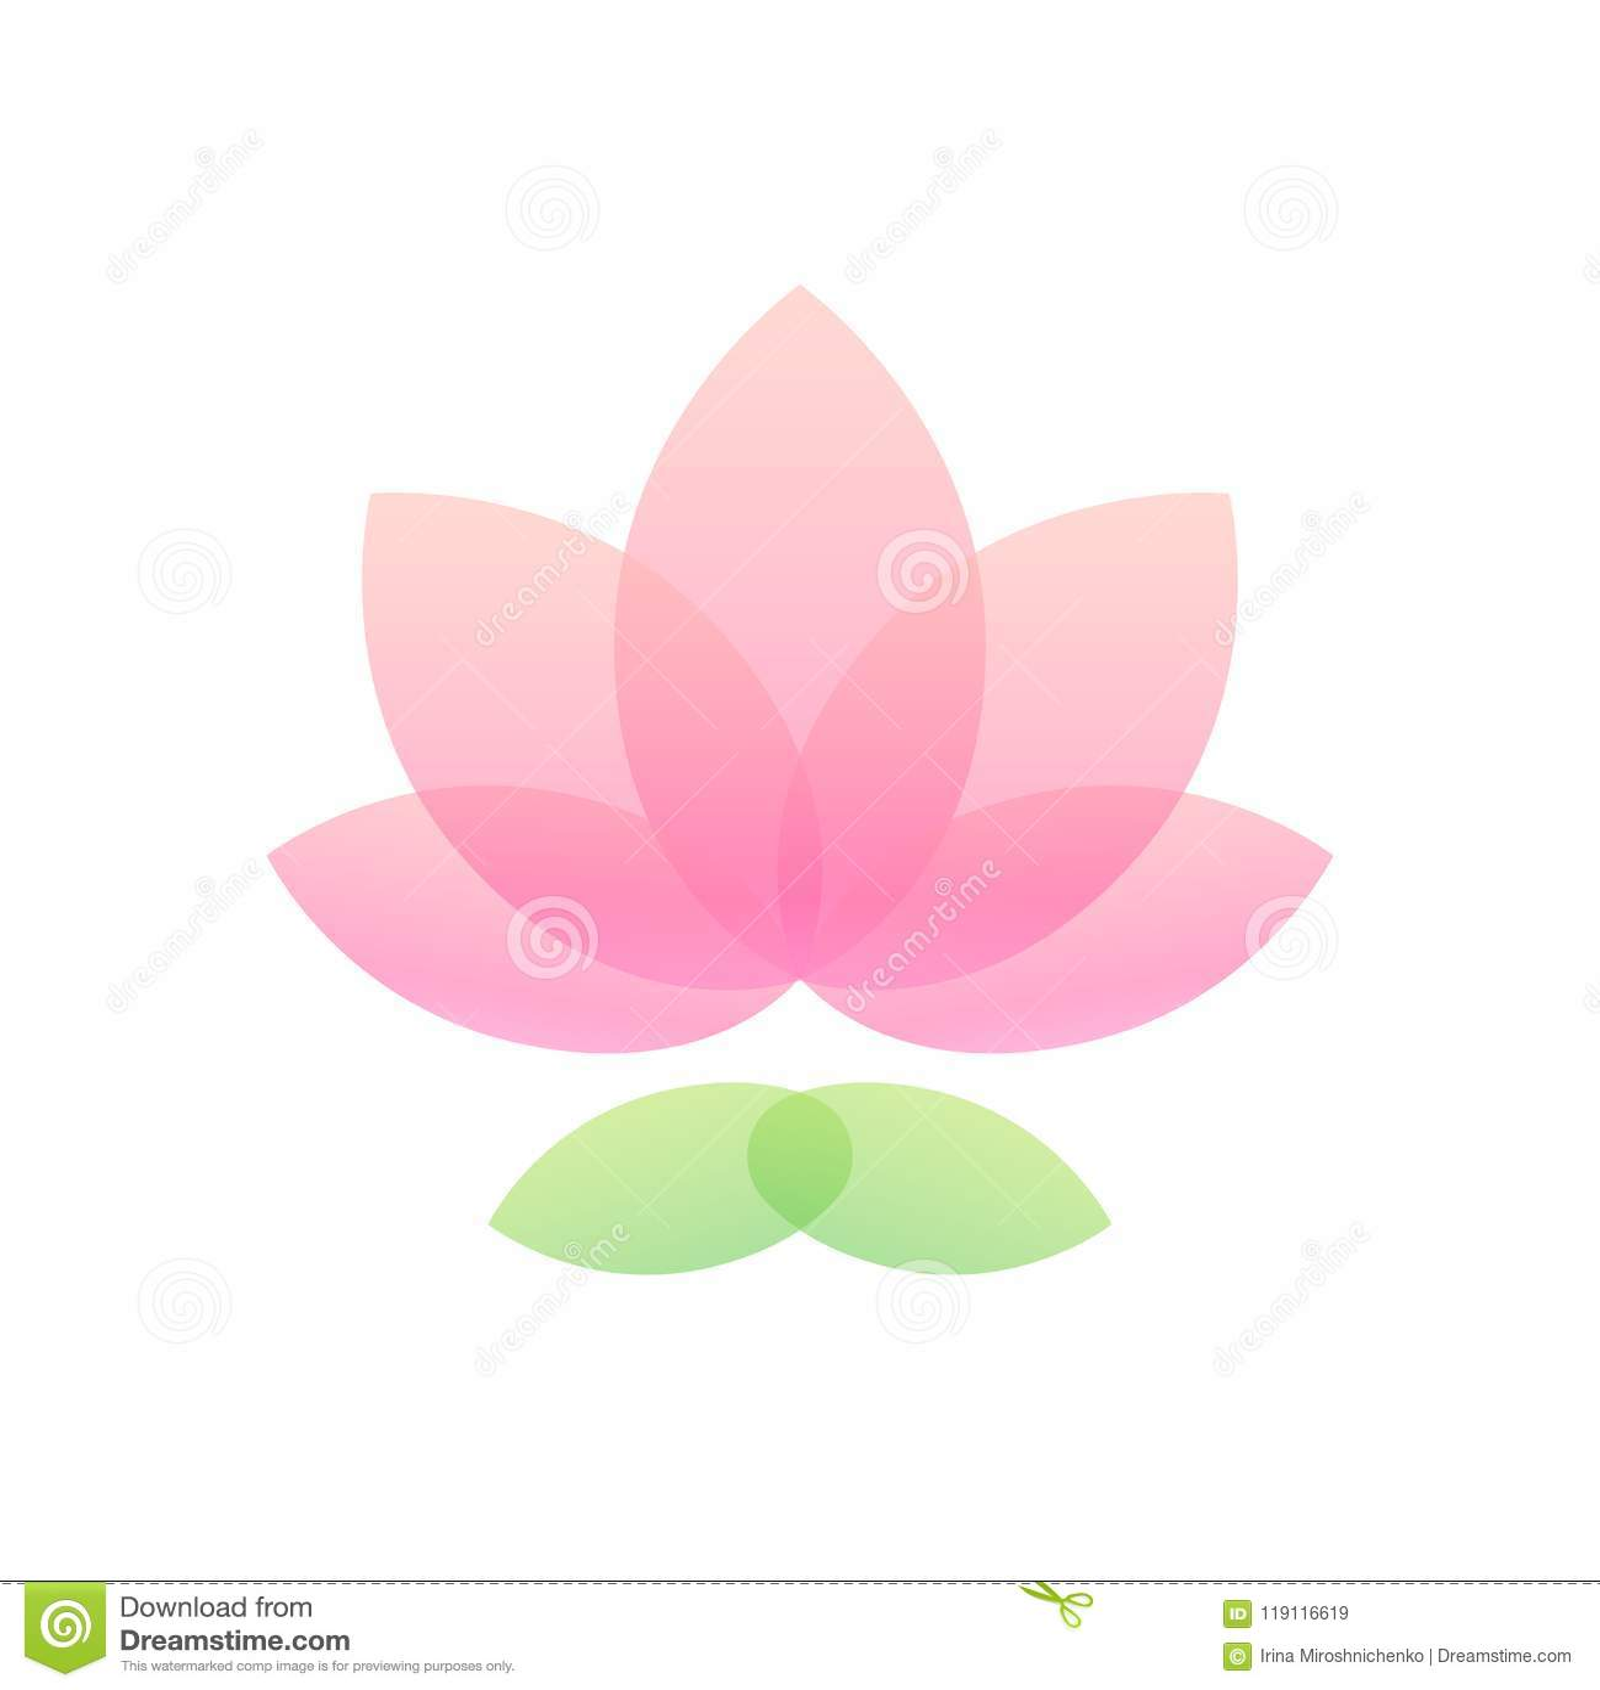 Lotus Flower Icon Stock Vector Illustration Of Medicine 119116619